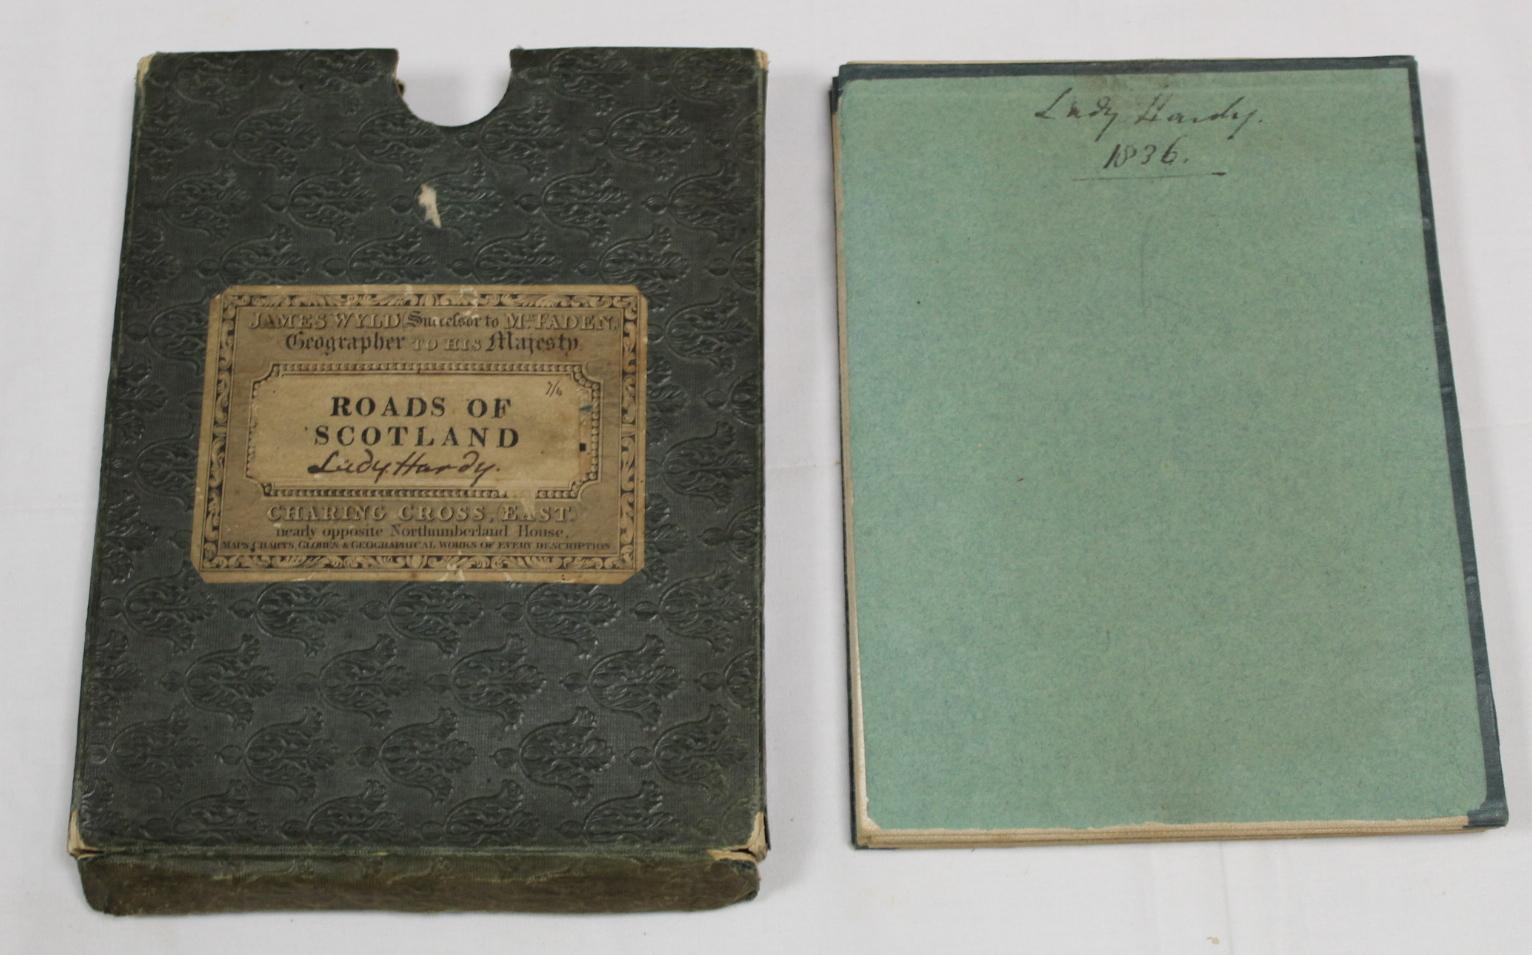 KIRKWOOD J. & SONS.Map of Scotland. Hand col. eng. fldg. linen map in well worn orig. slip case. - Image 25 of 36